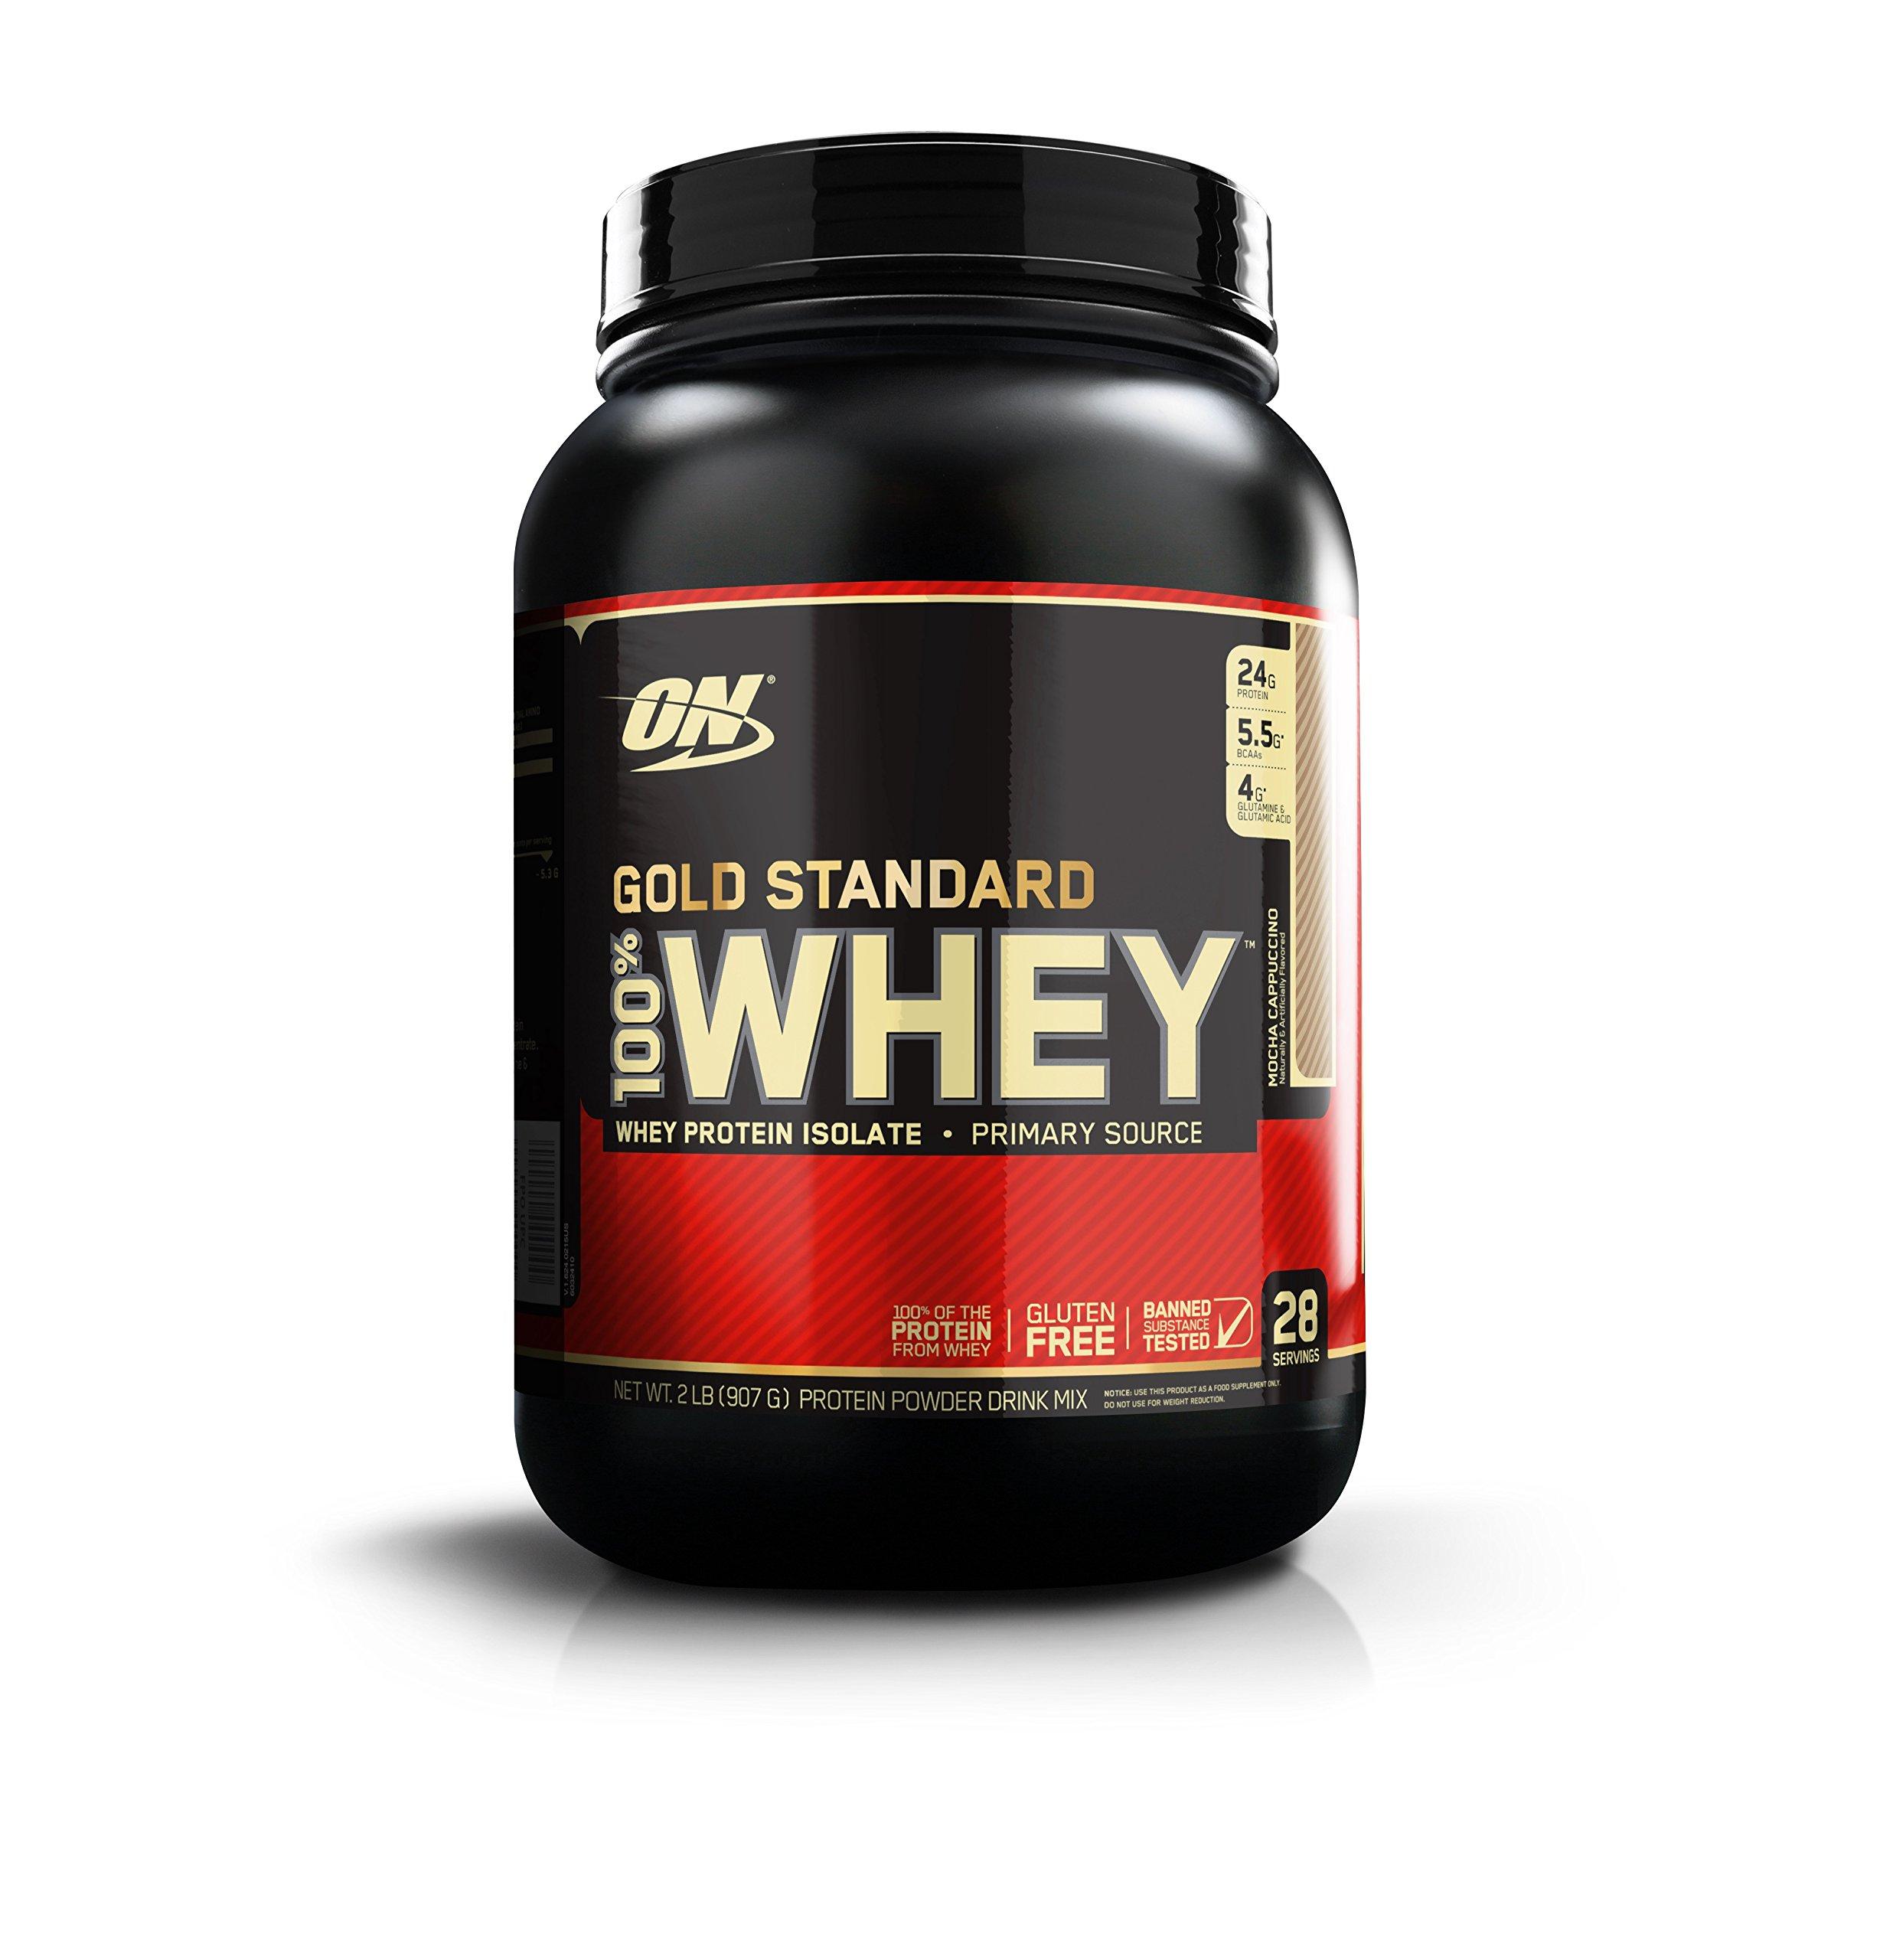 OPTIMUM NUTRITION GOLD STANDARD 100% Whey Protein Powder, Mocha Cappuccino, 2 Pound by Optimum Nutrition